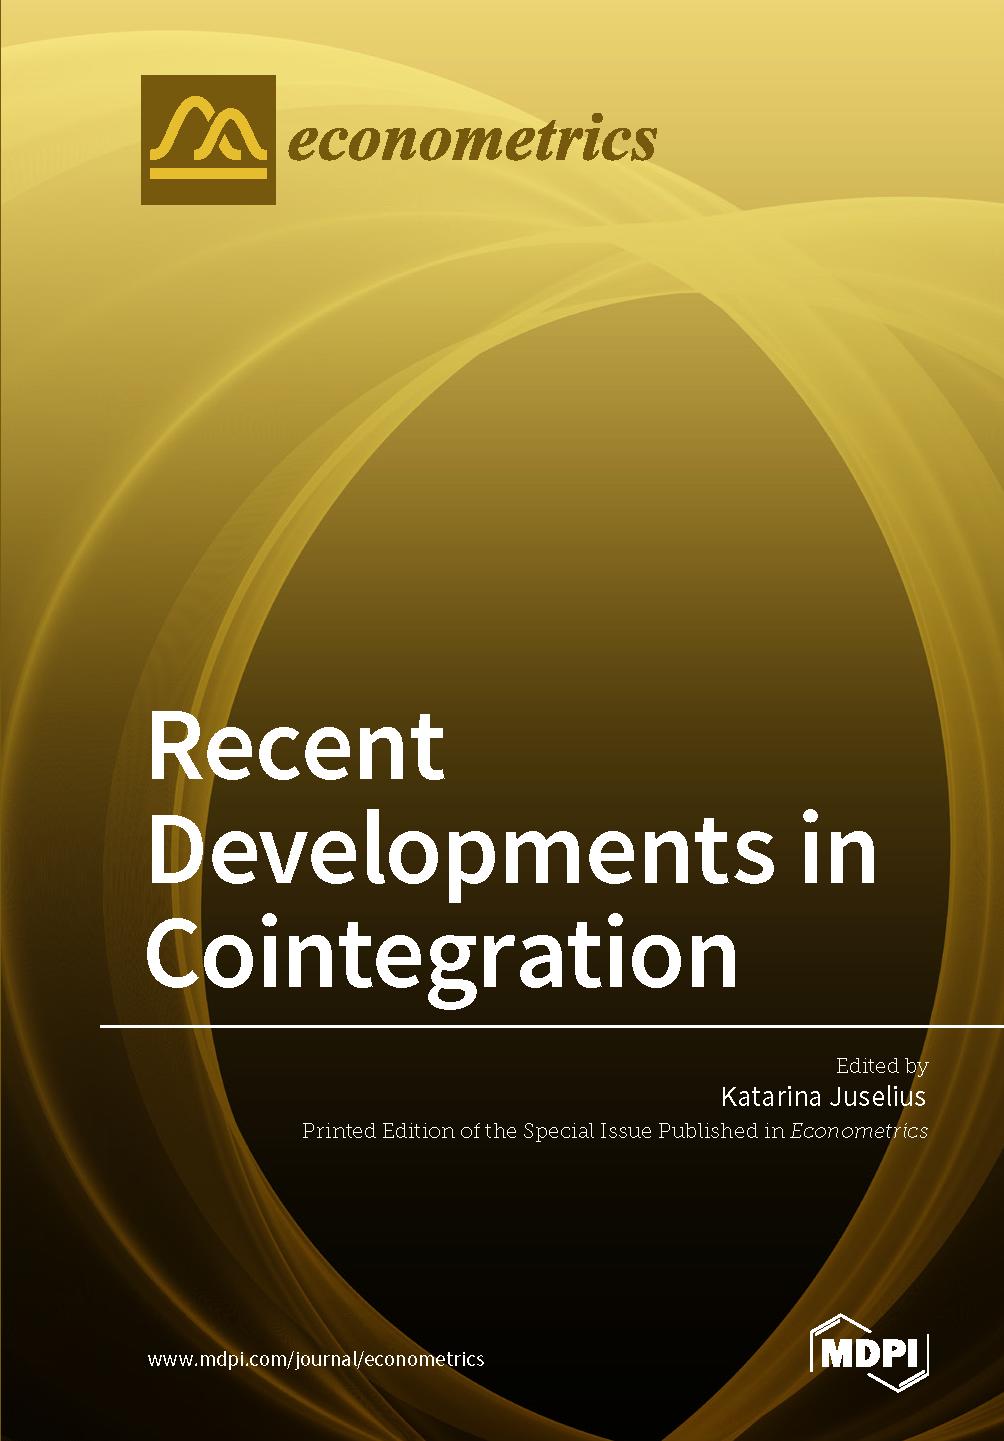 Recent Developments in Cointegration